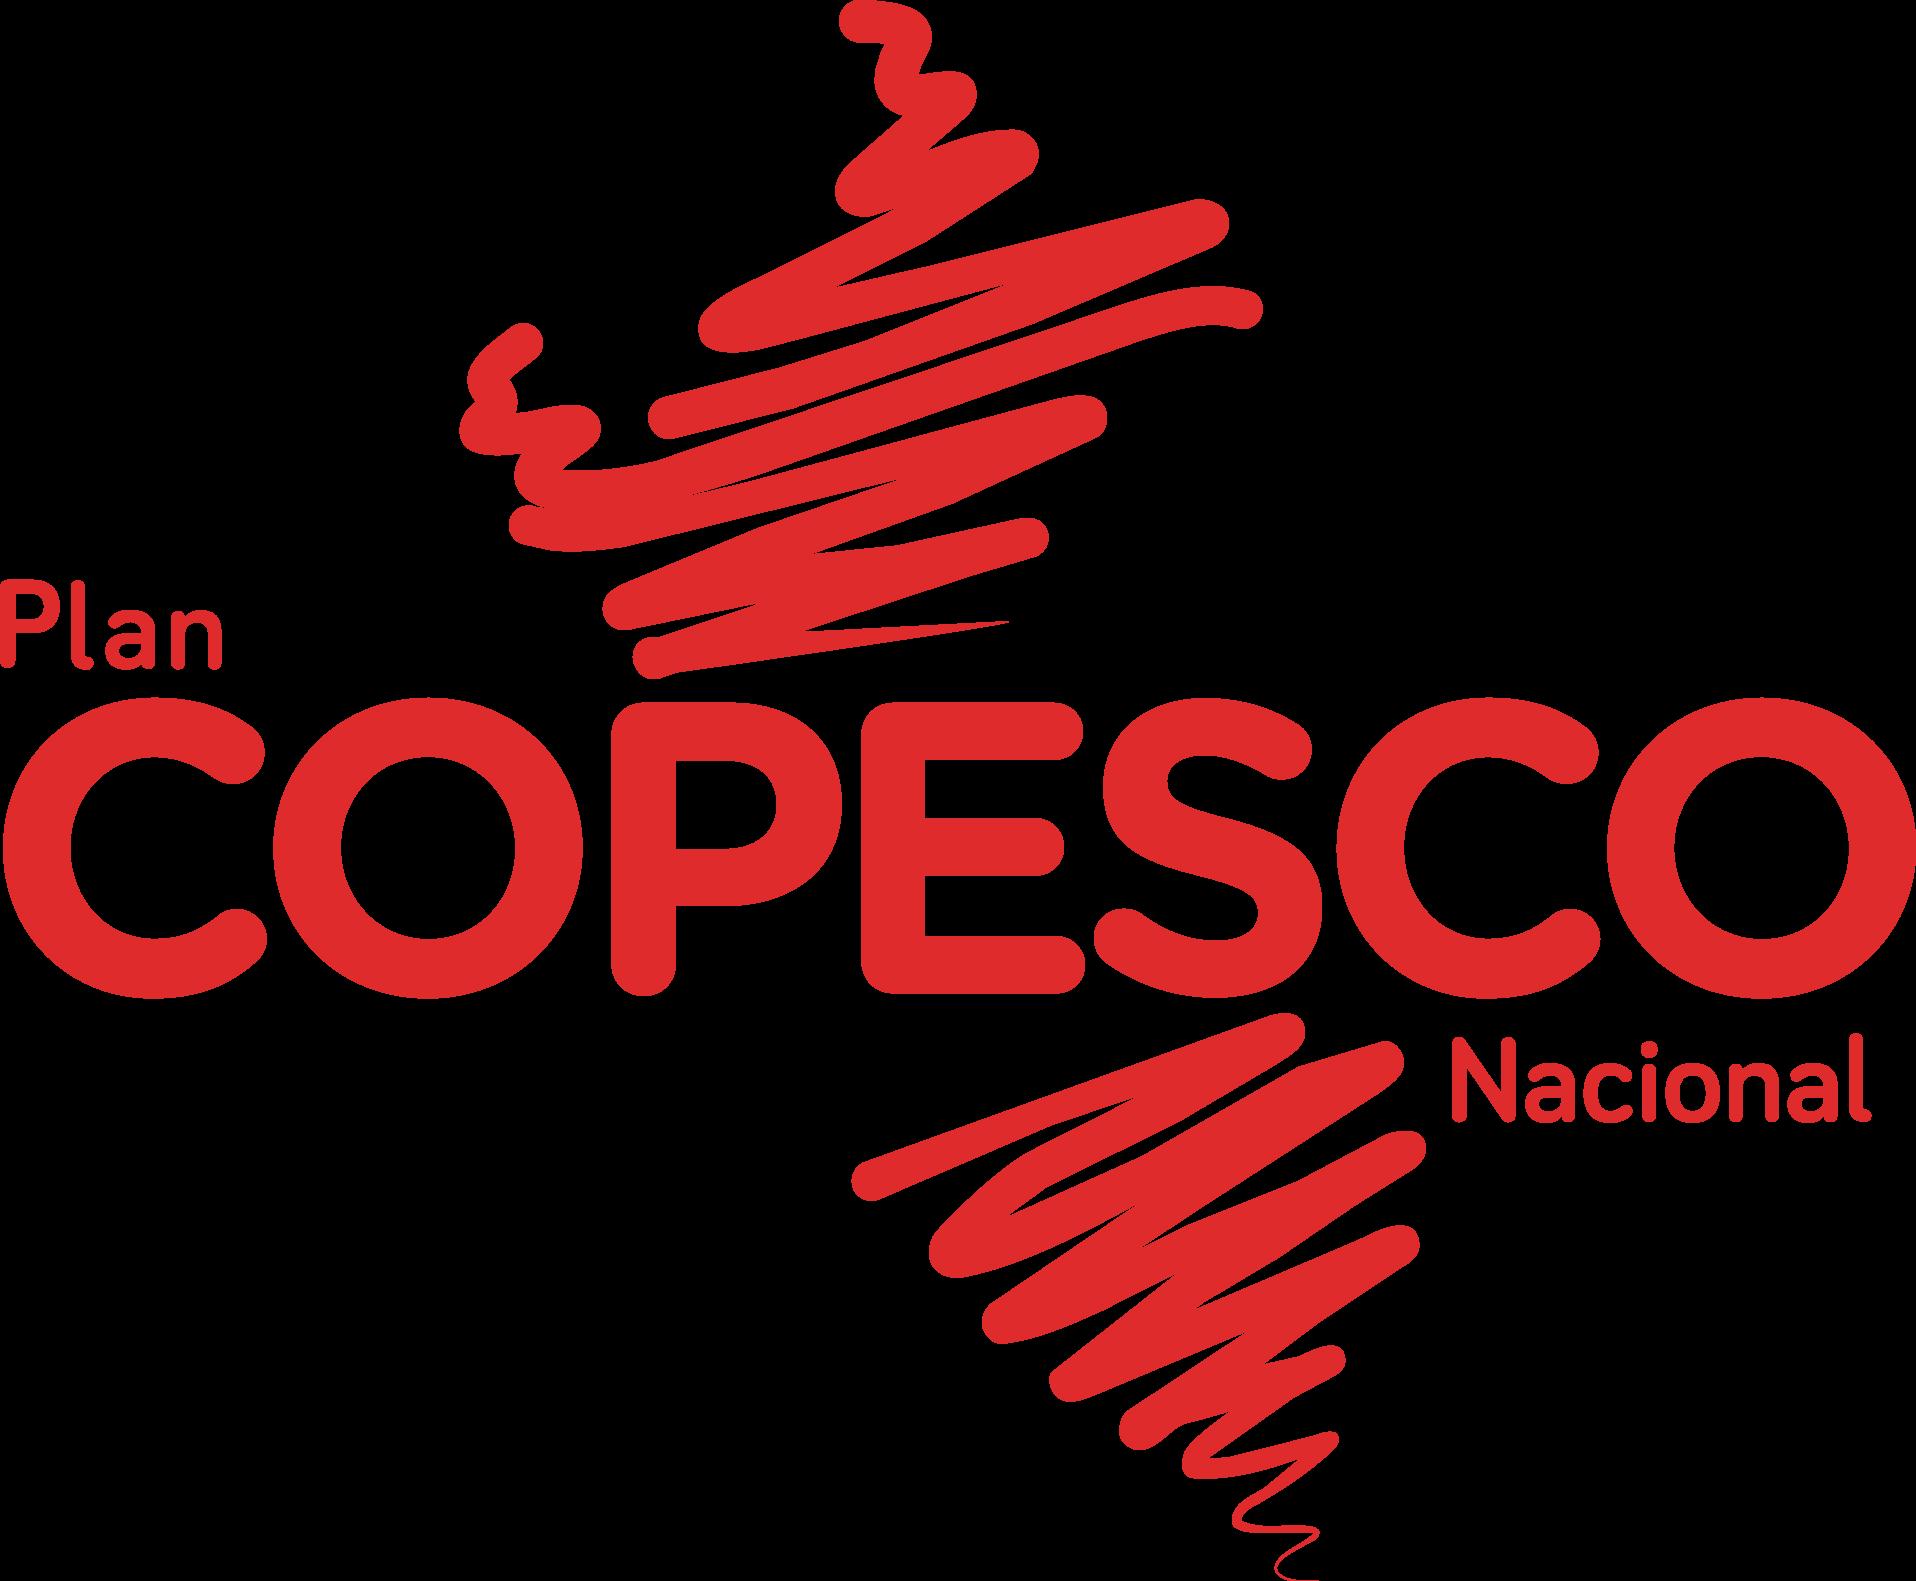 Plan COPESCO